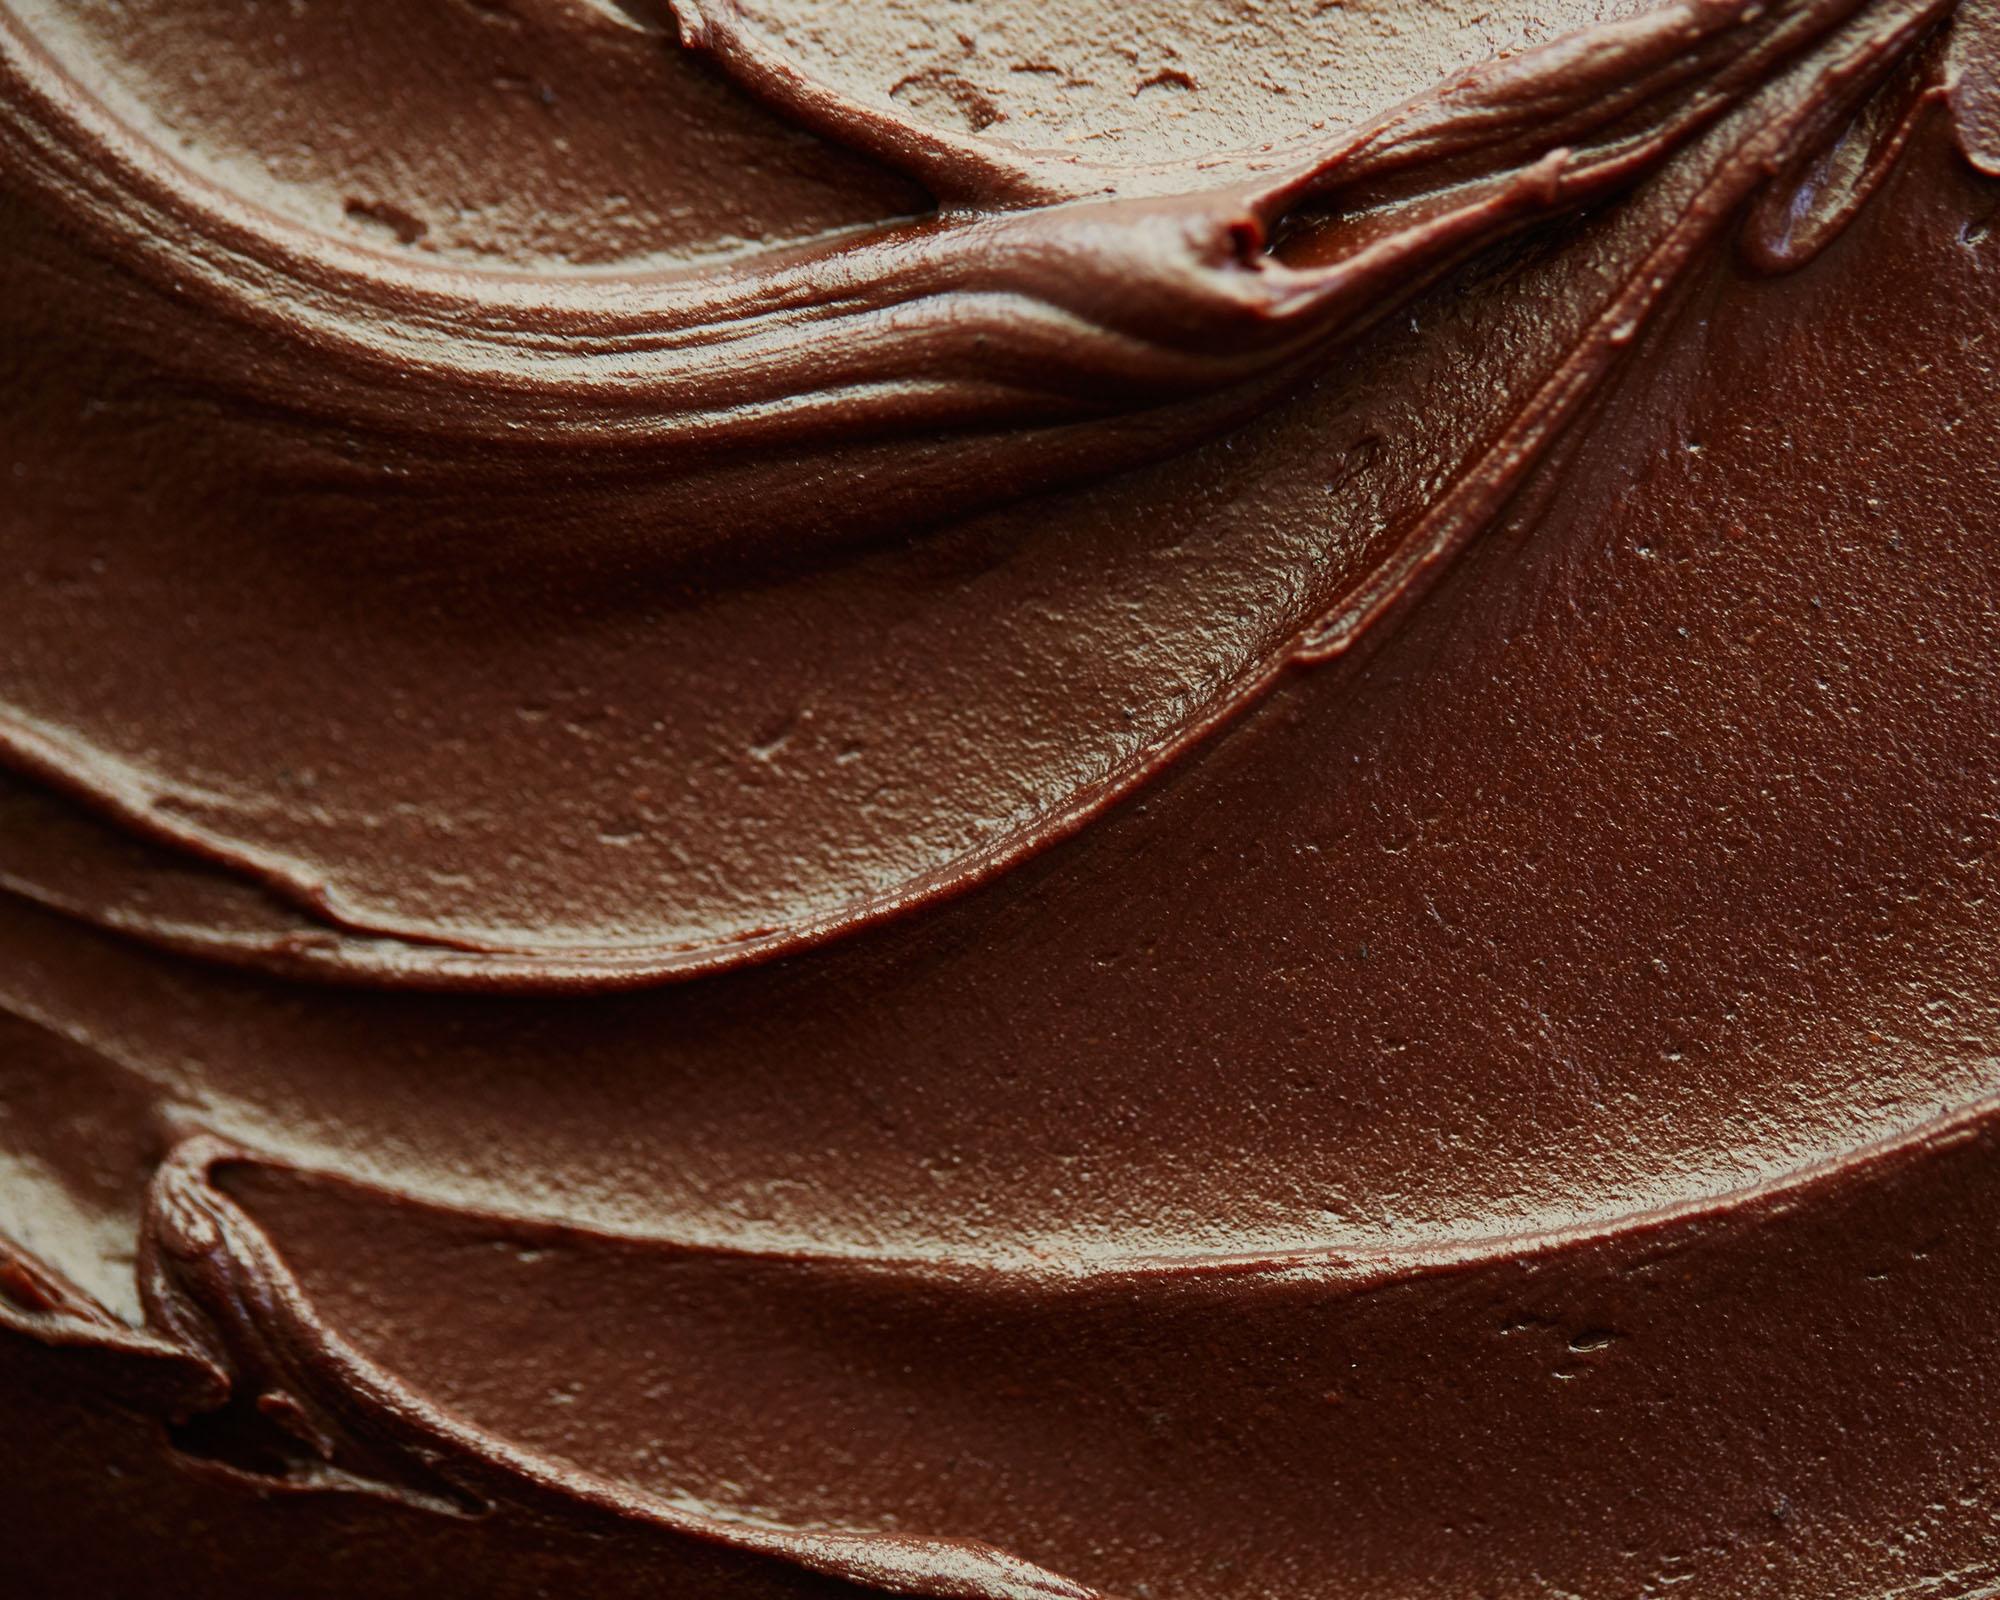 20150915_Tia_Desserts_ChocolateCake_026_testPrint.jpg